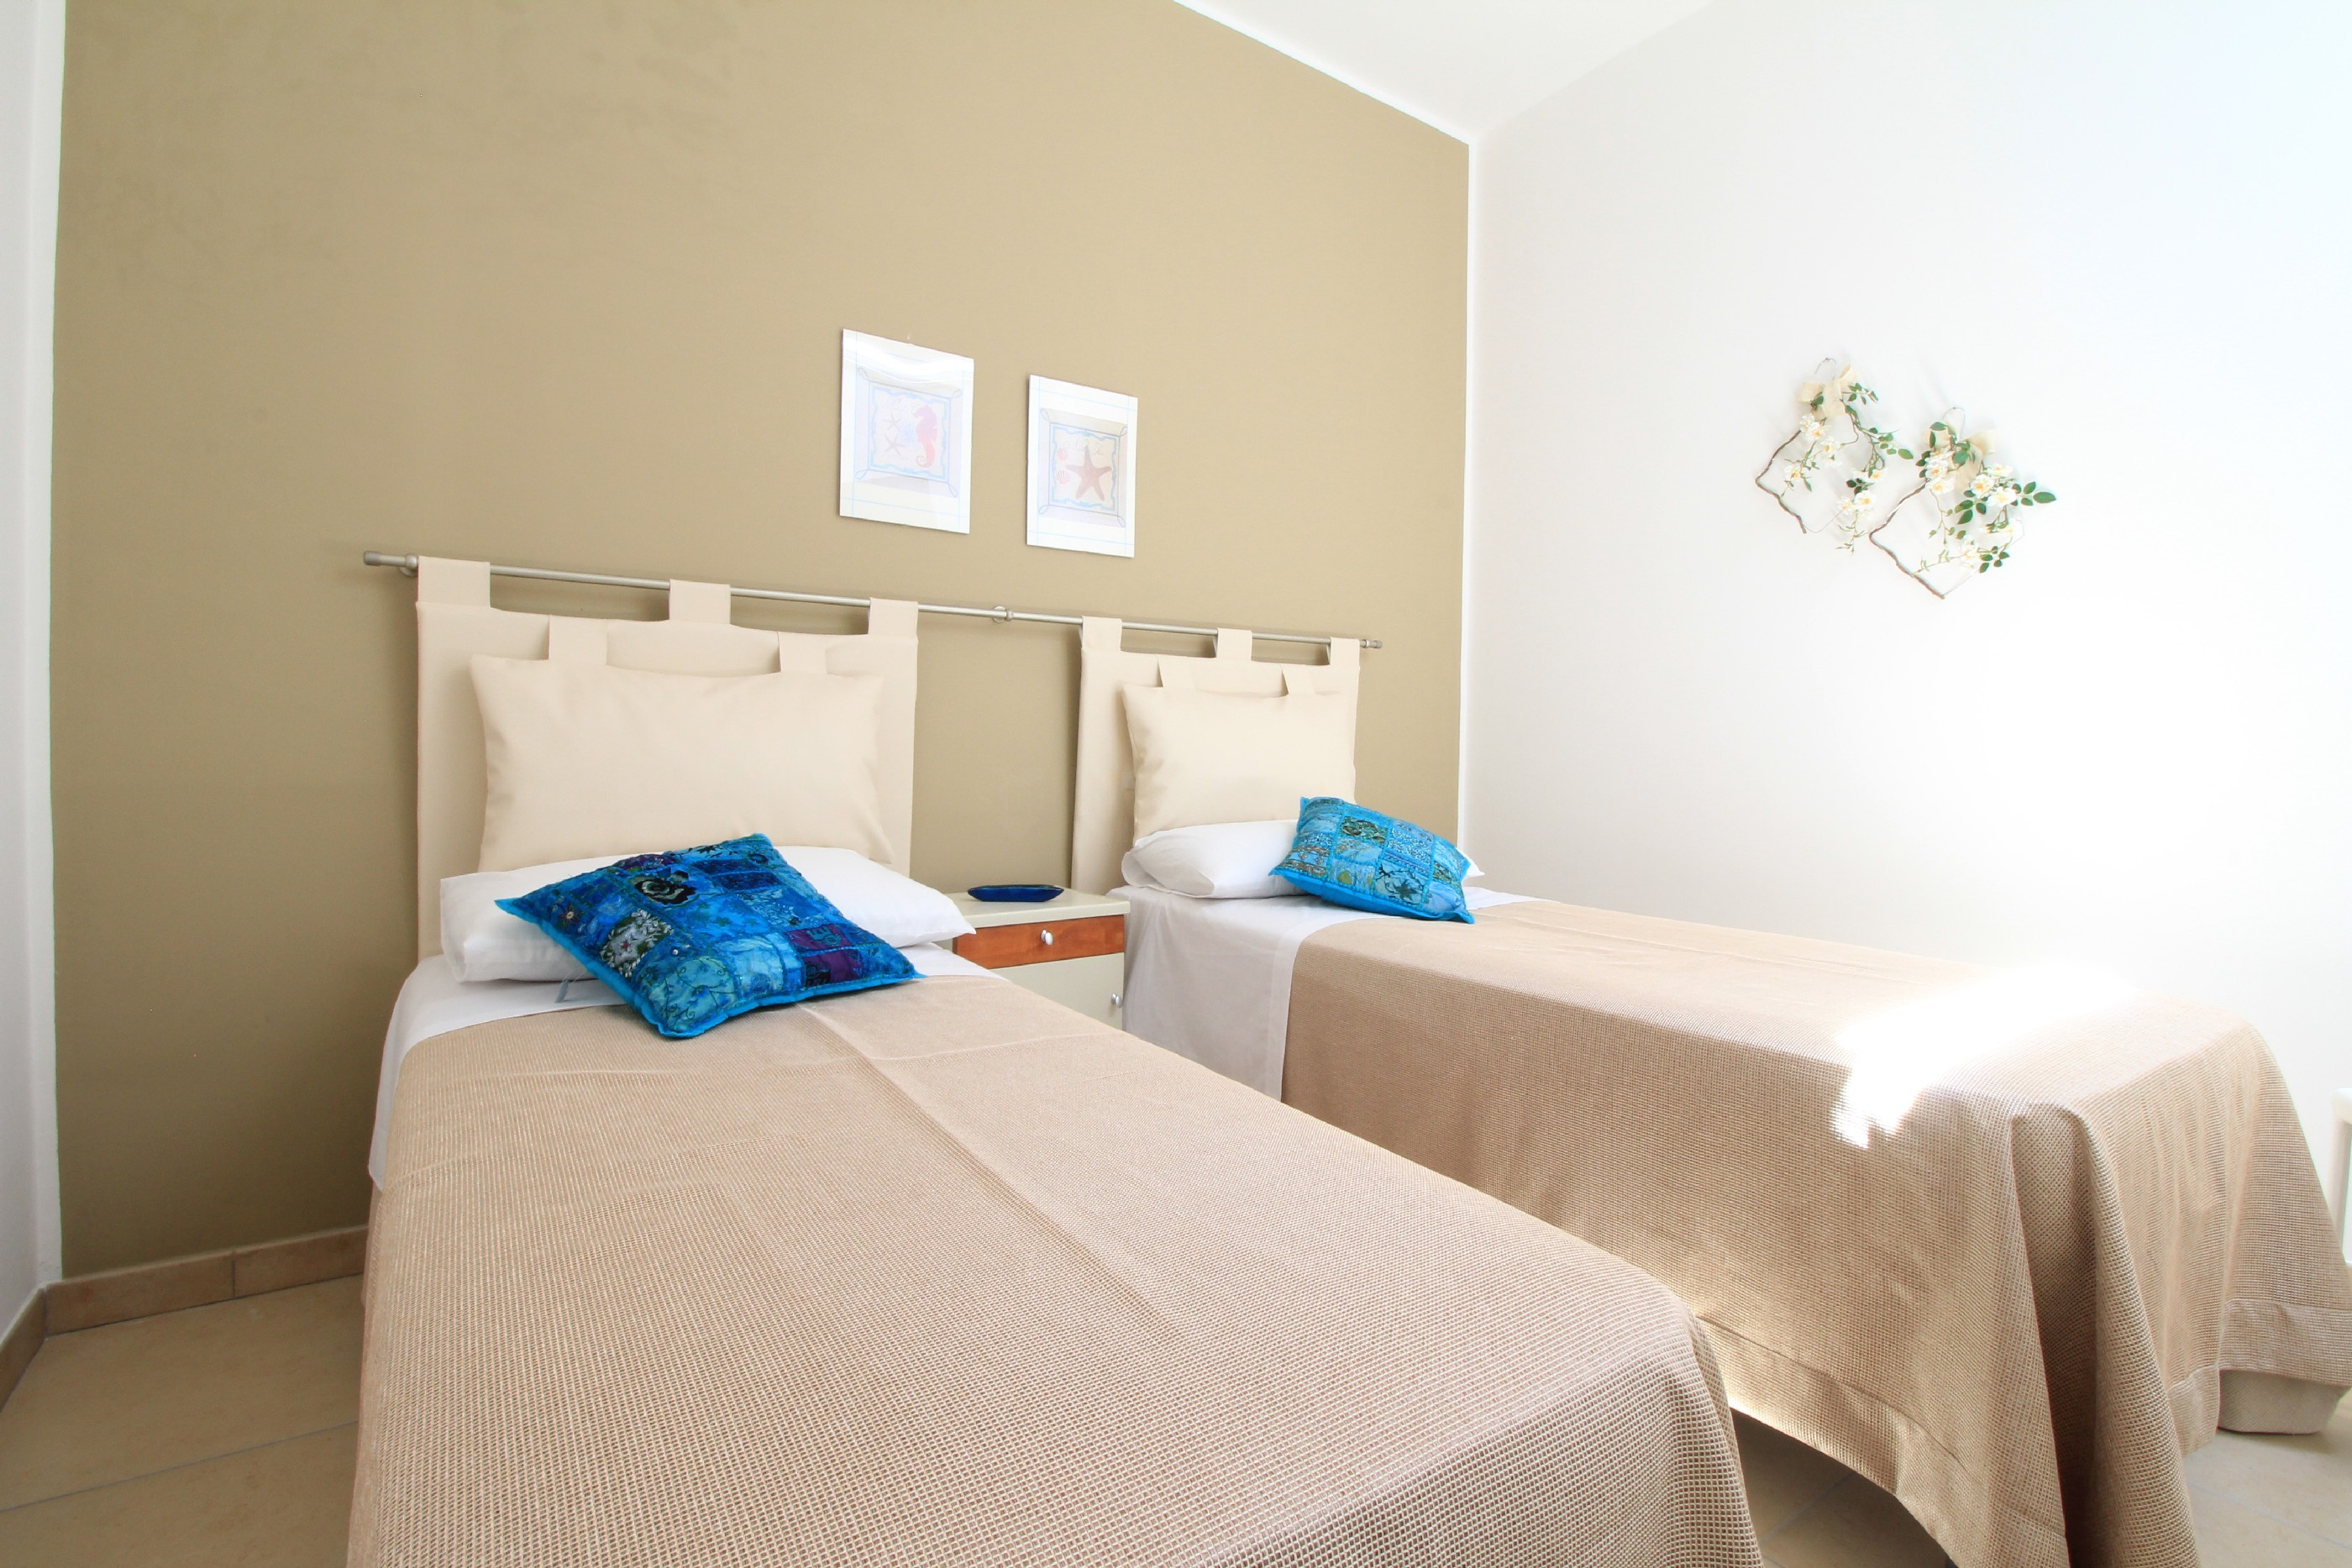 Elcisia luxe beach house photo 20076159